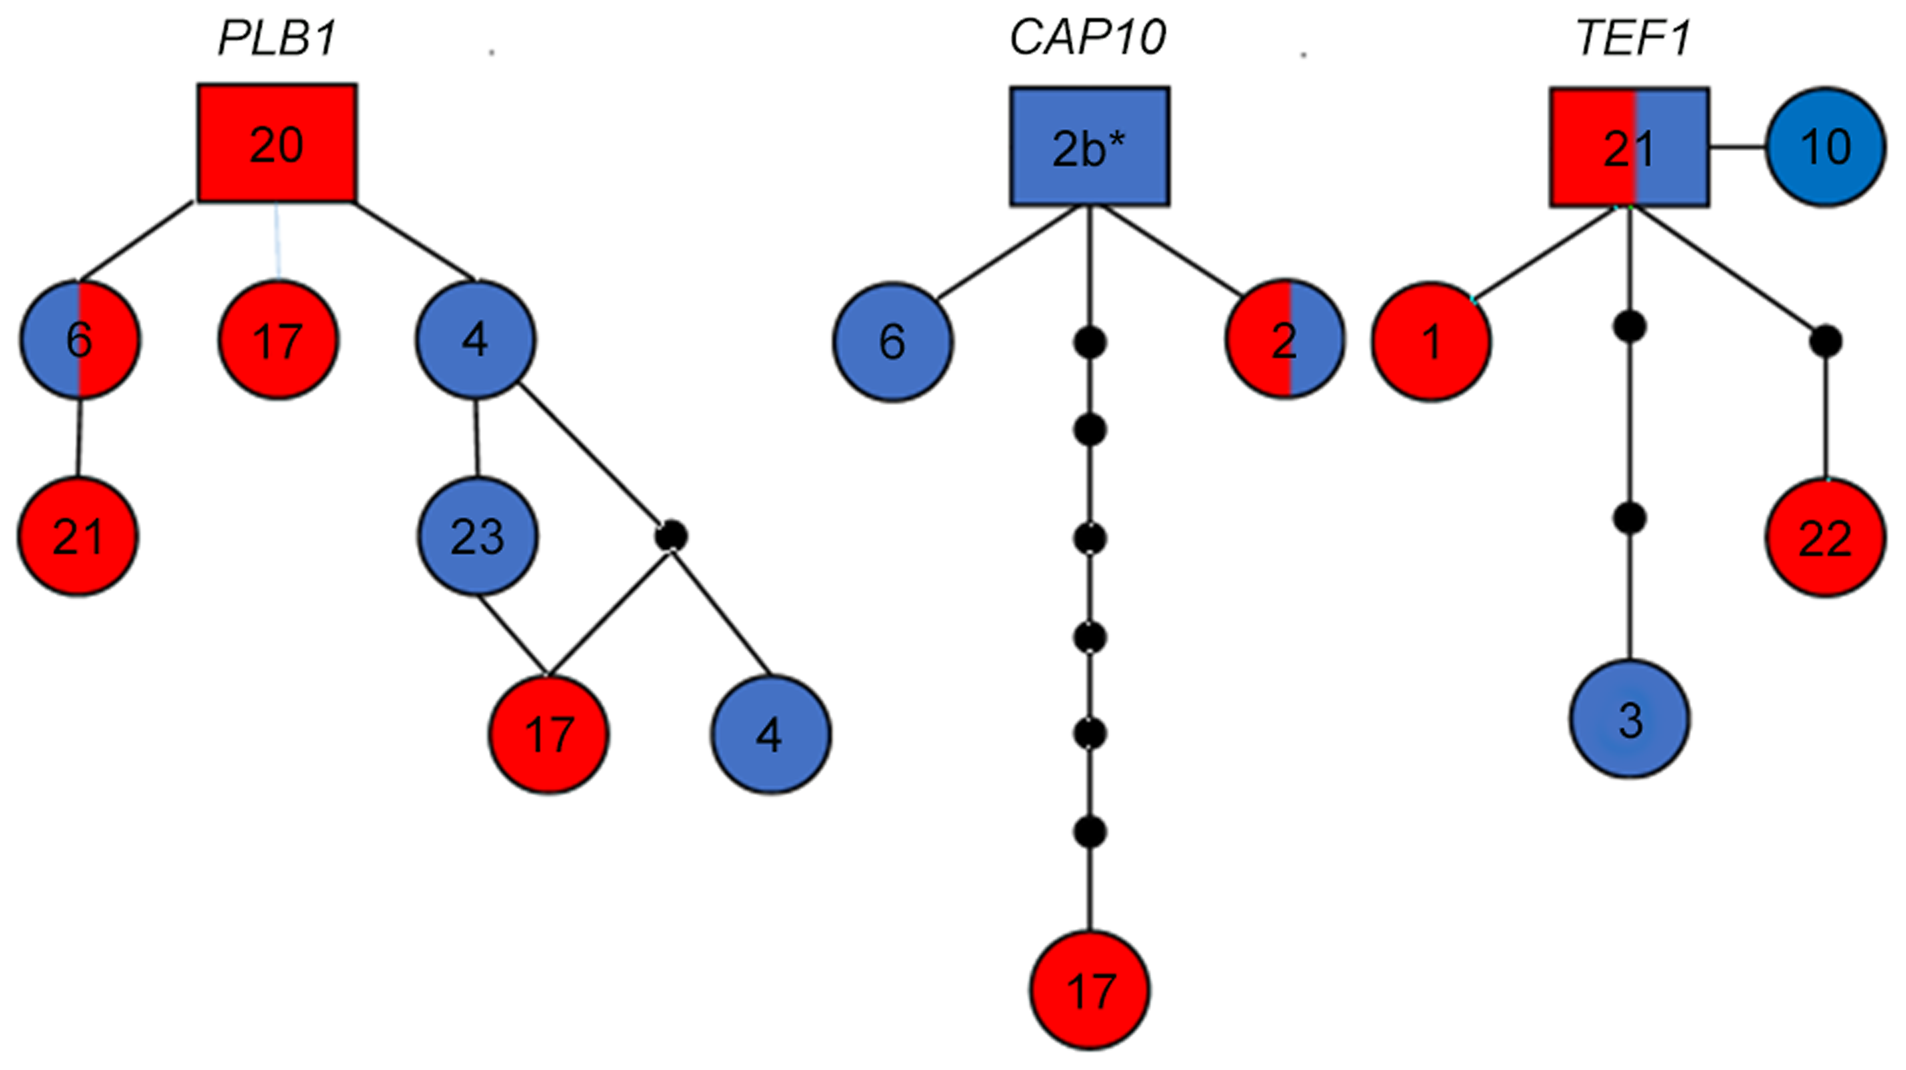 Haplotype network analysis suggests recent introgression between VGIIIa and VGIIIb.